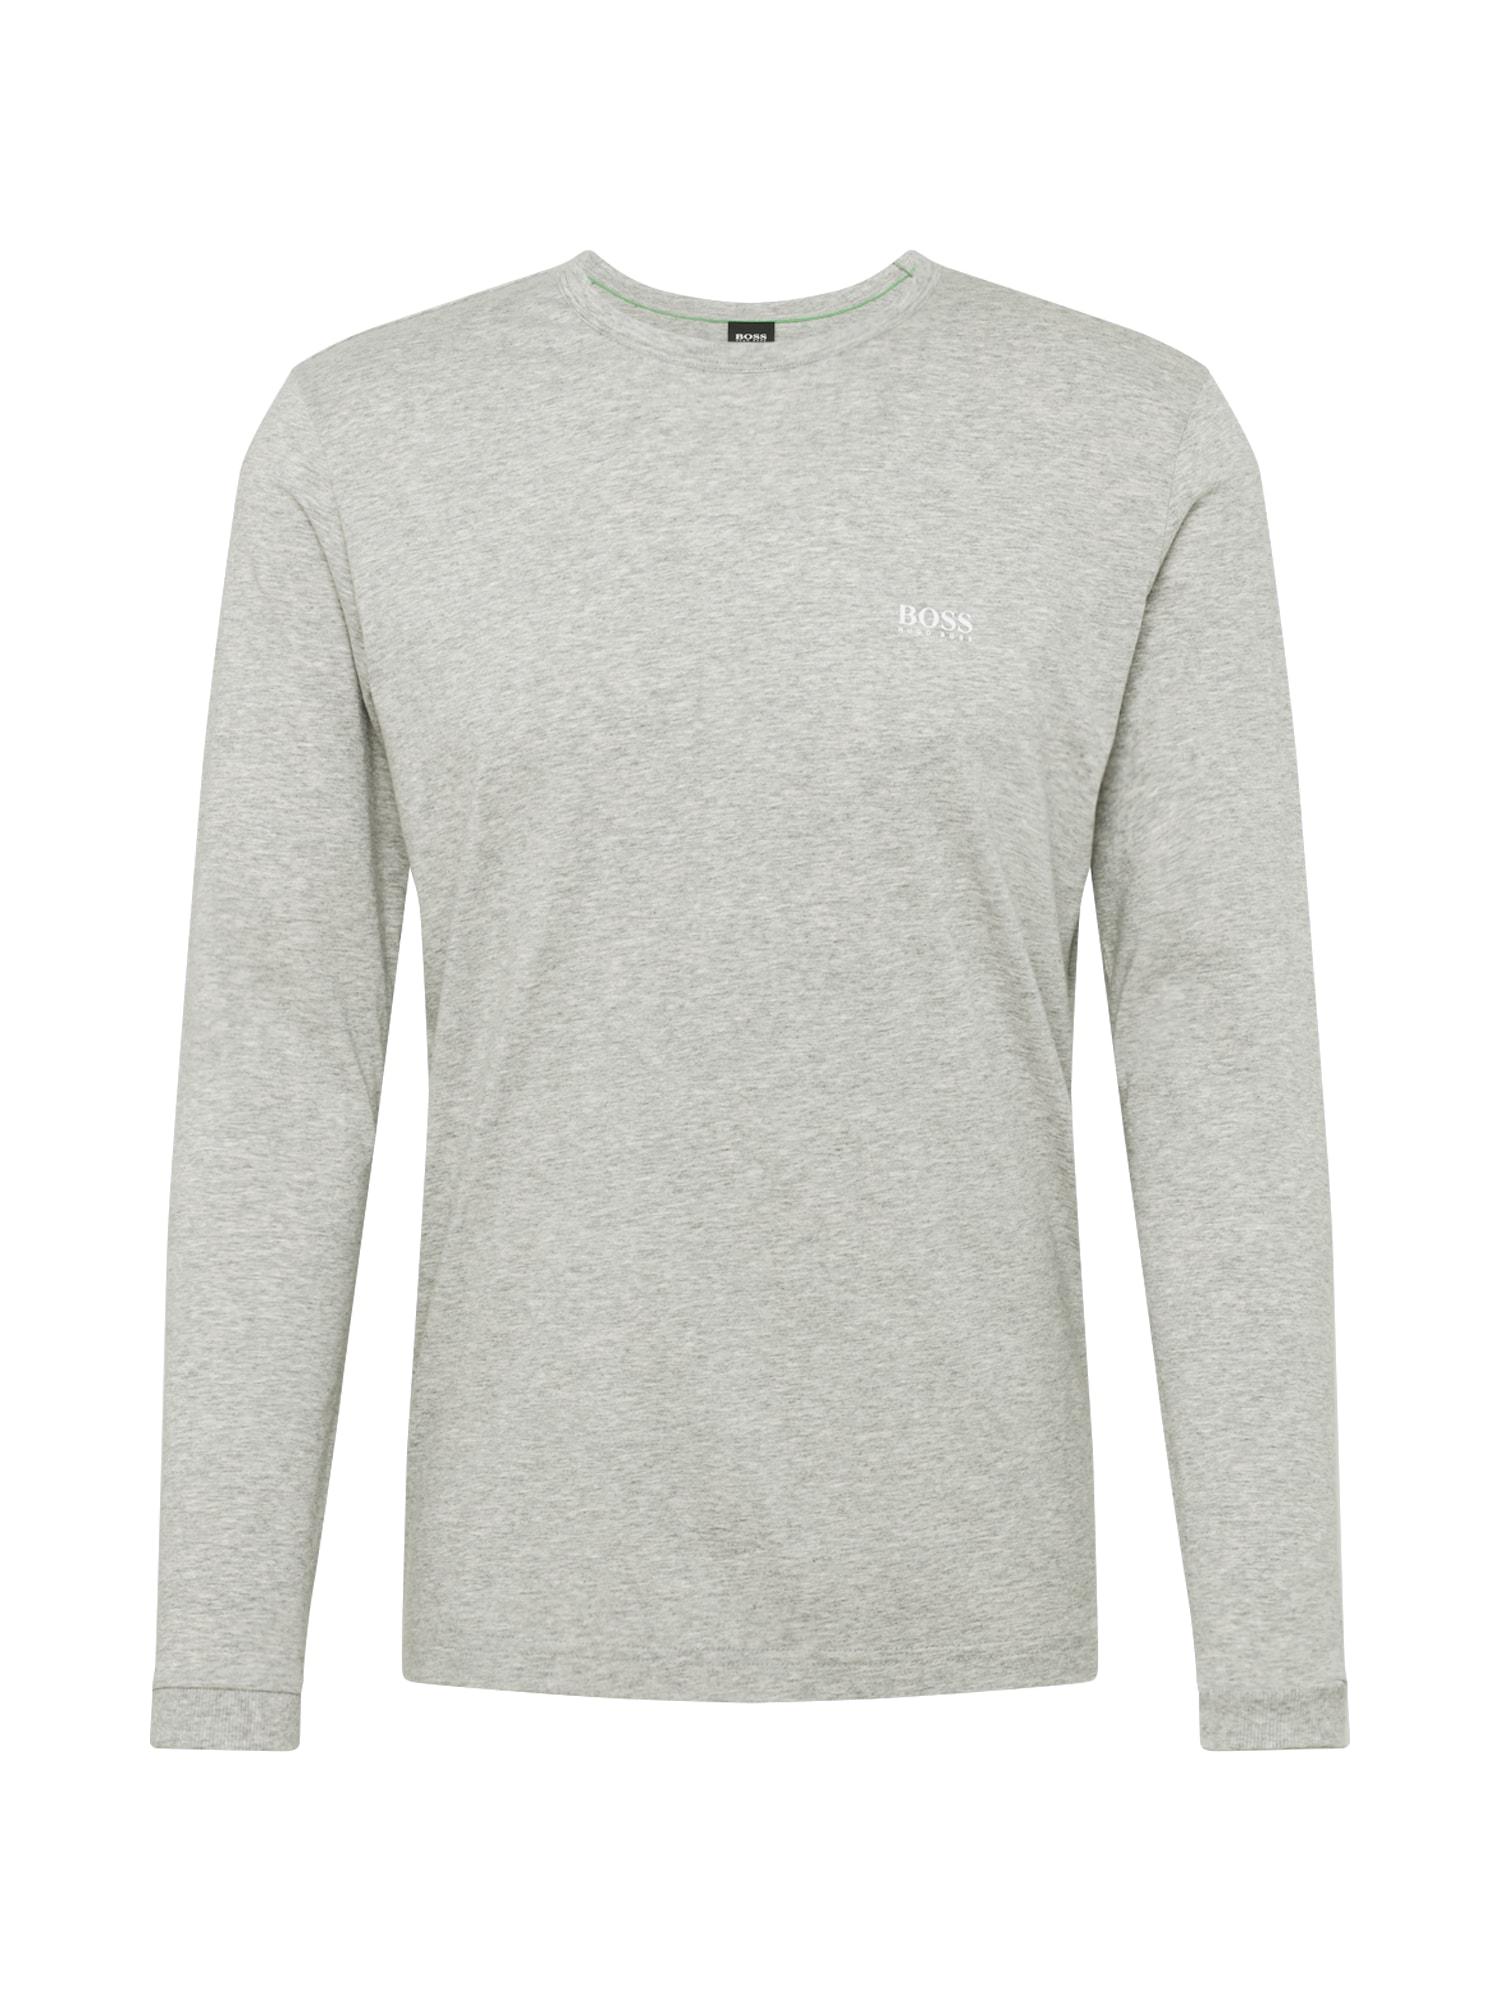 BOSS Marškinėliai 'Togn' pilka